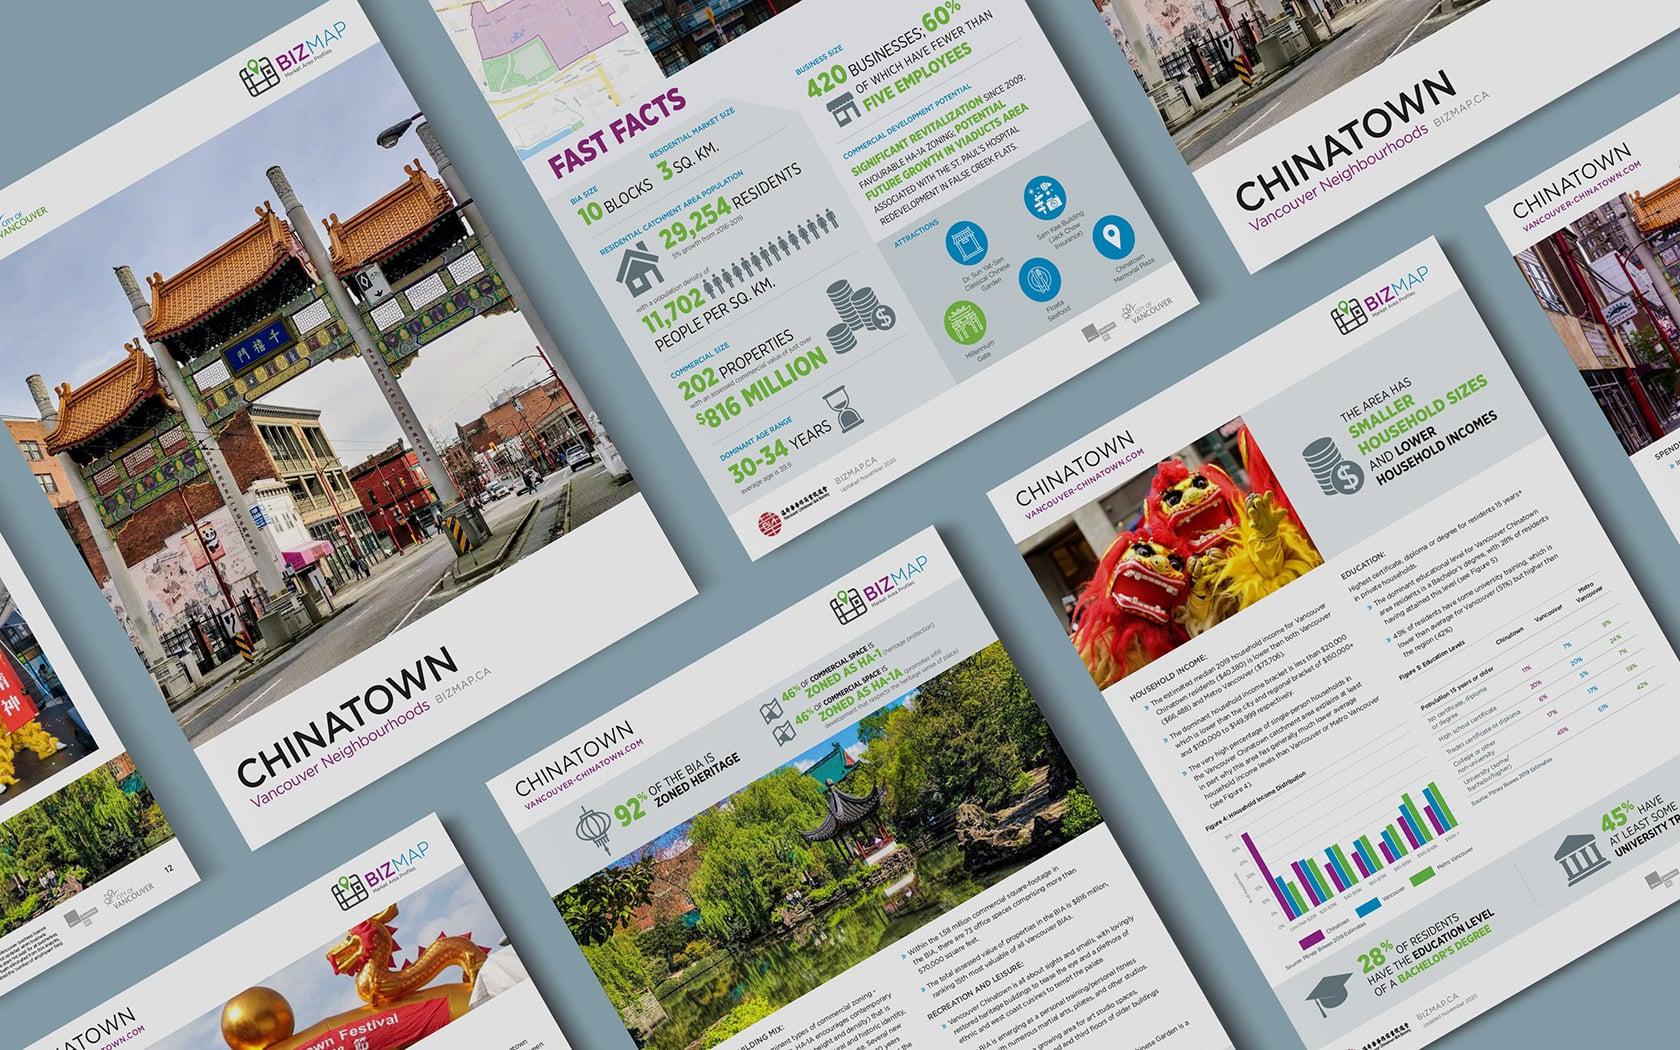 Small Business BC BizMap BIA Profiles Chinatown